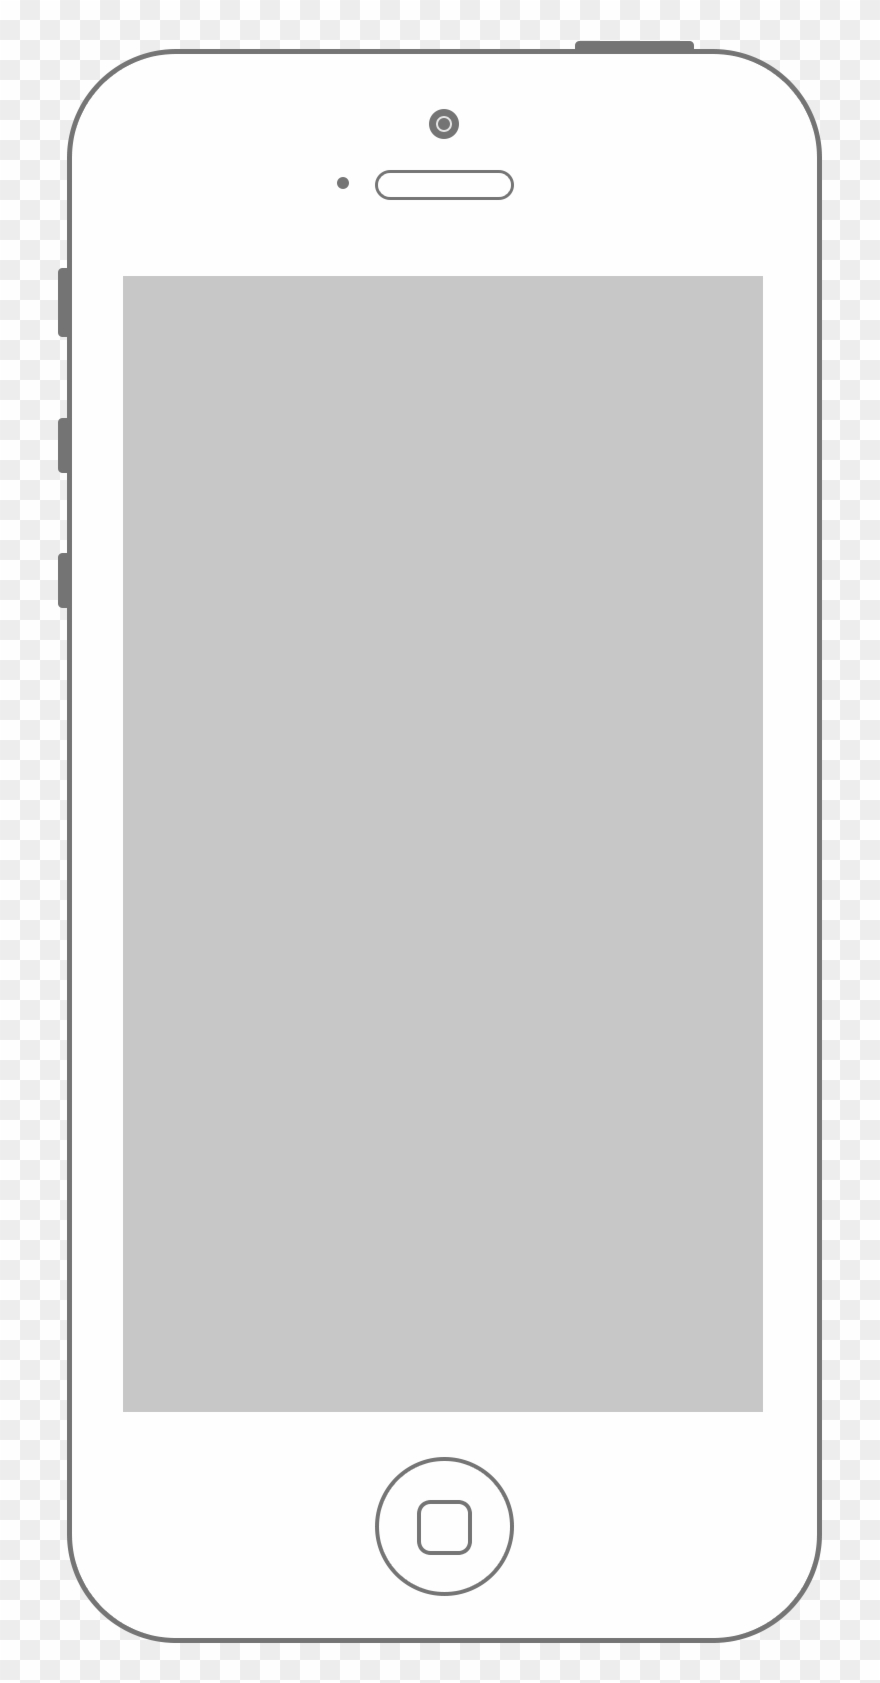 Apple Iphone Clipart Blank.